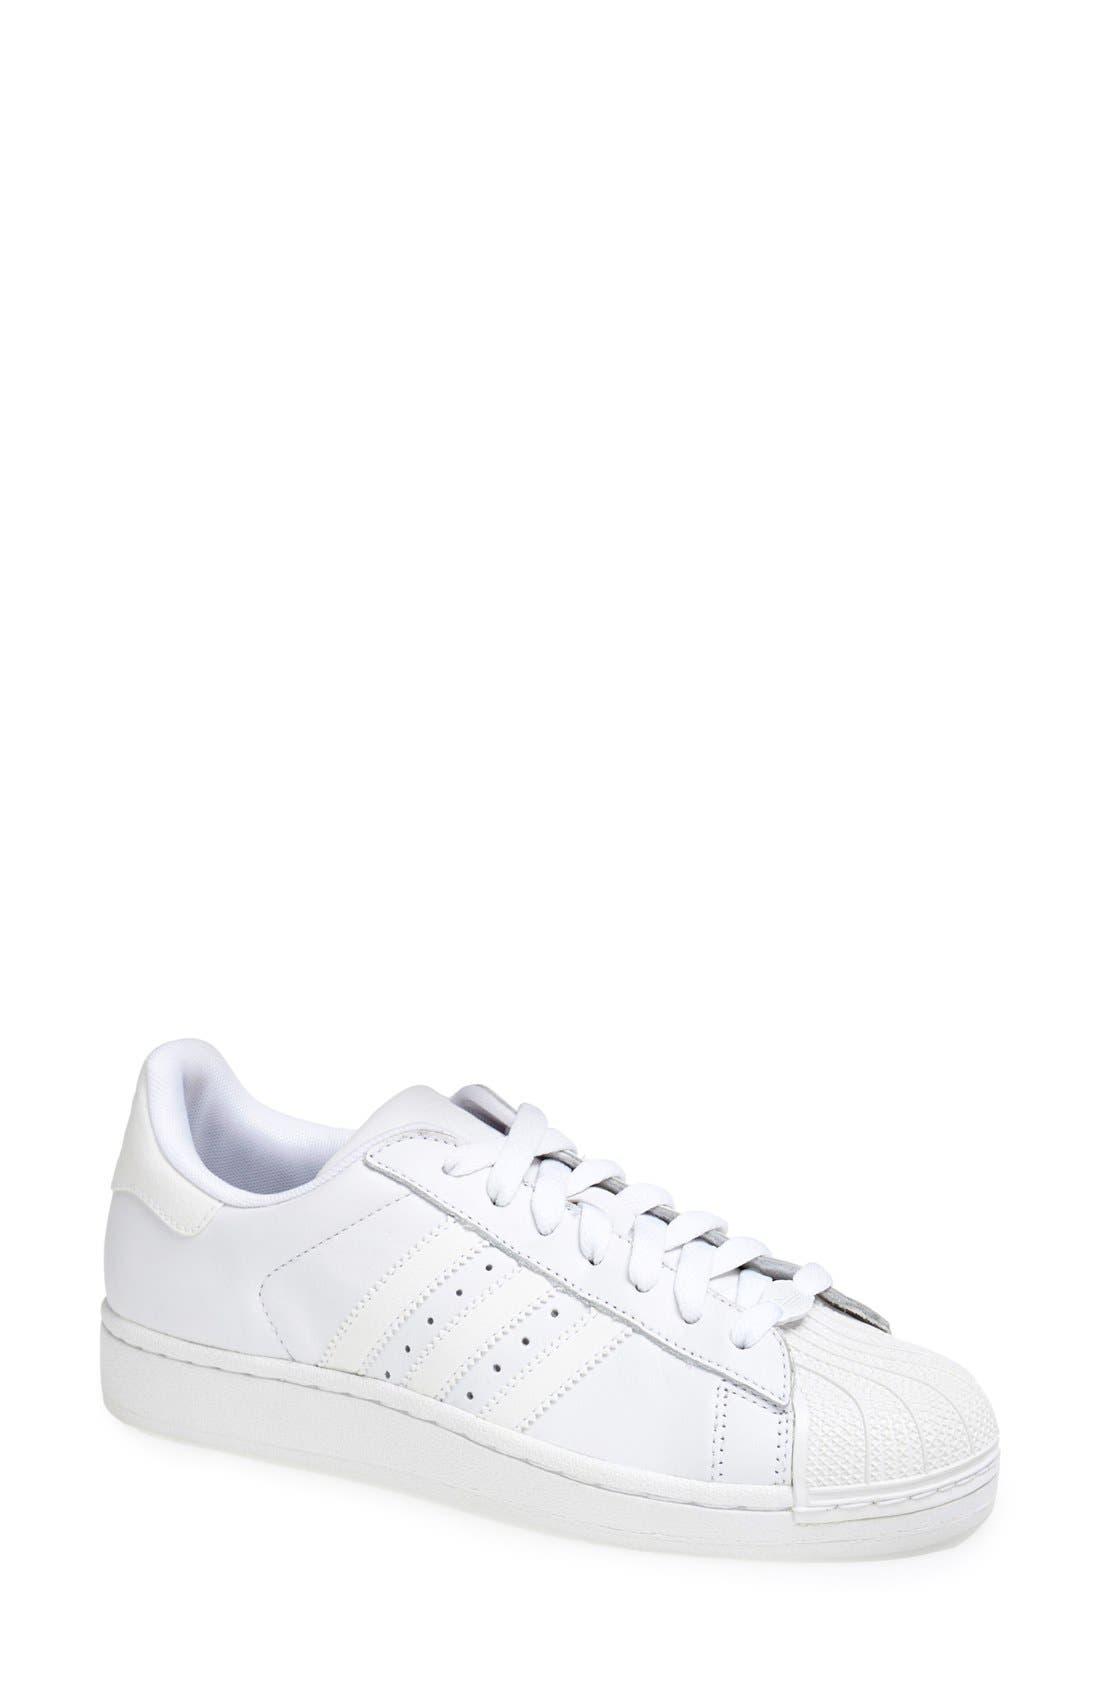 Main Image - adidas 'Superstar II' Sneaker (Women)